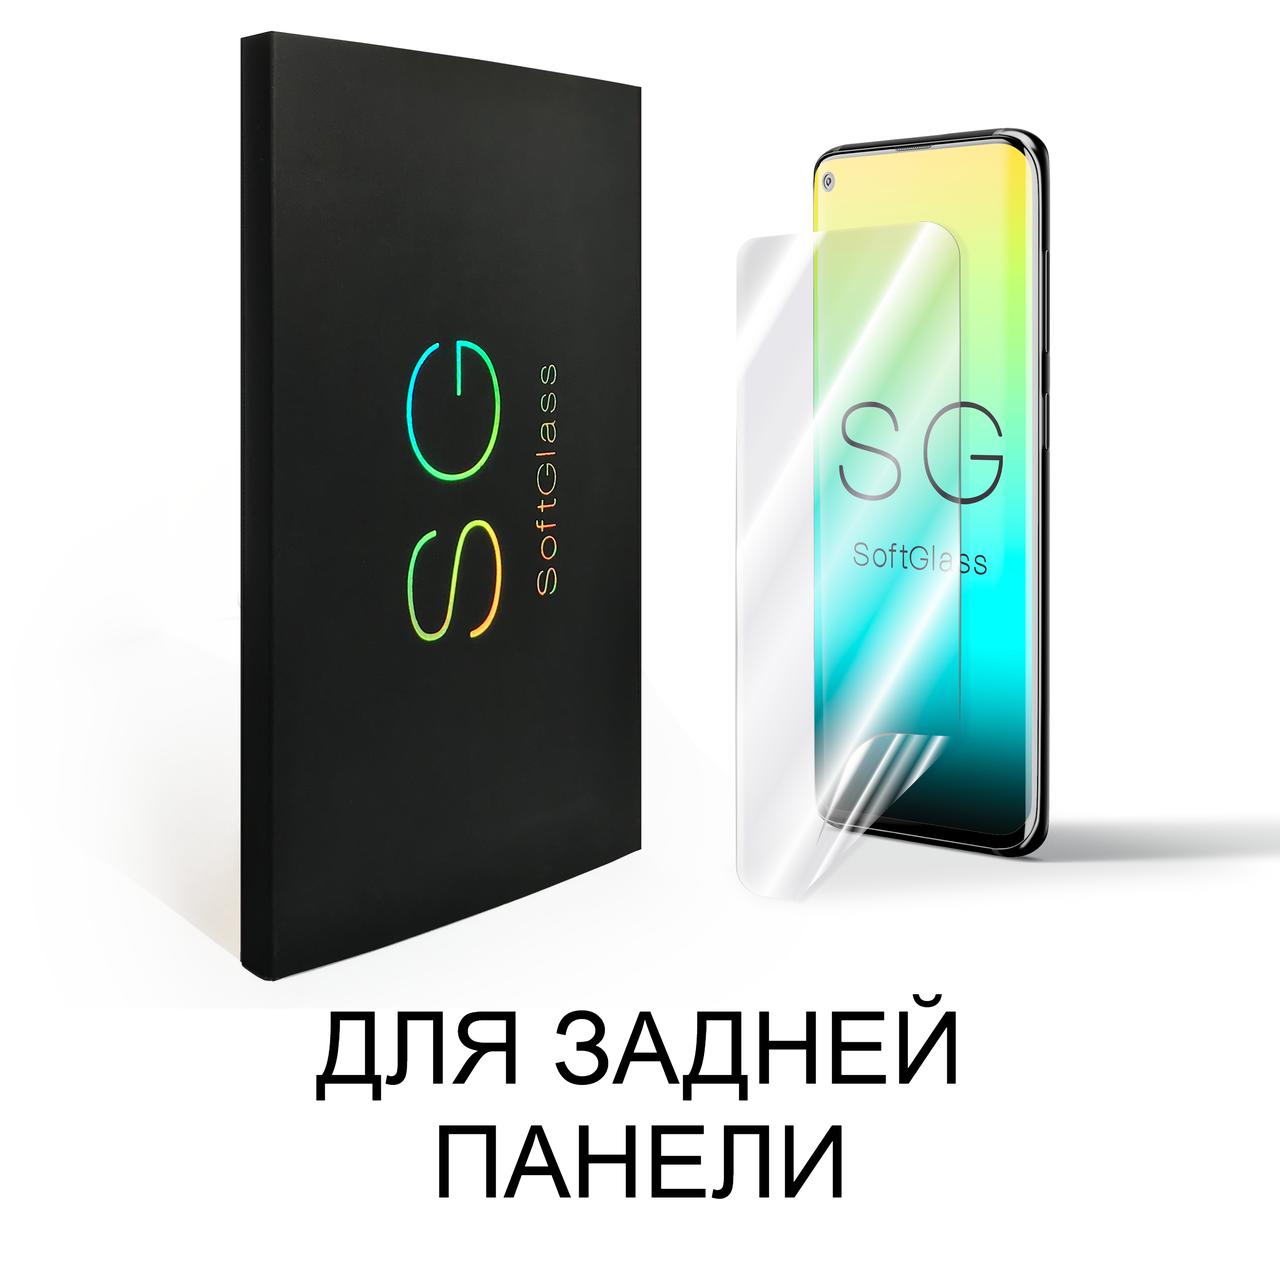 Мягкое стекло Asus Zenfone 4 Max Pro ZE554KL Задняя